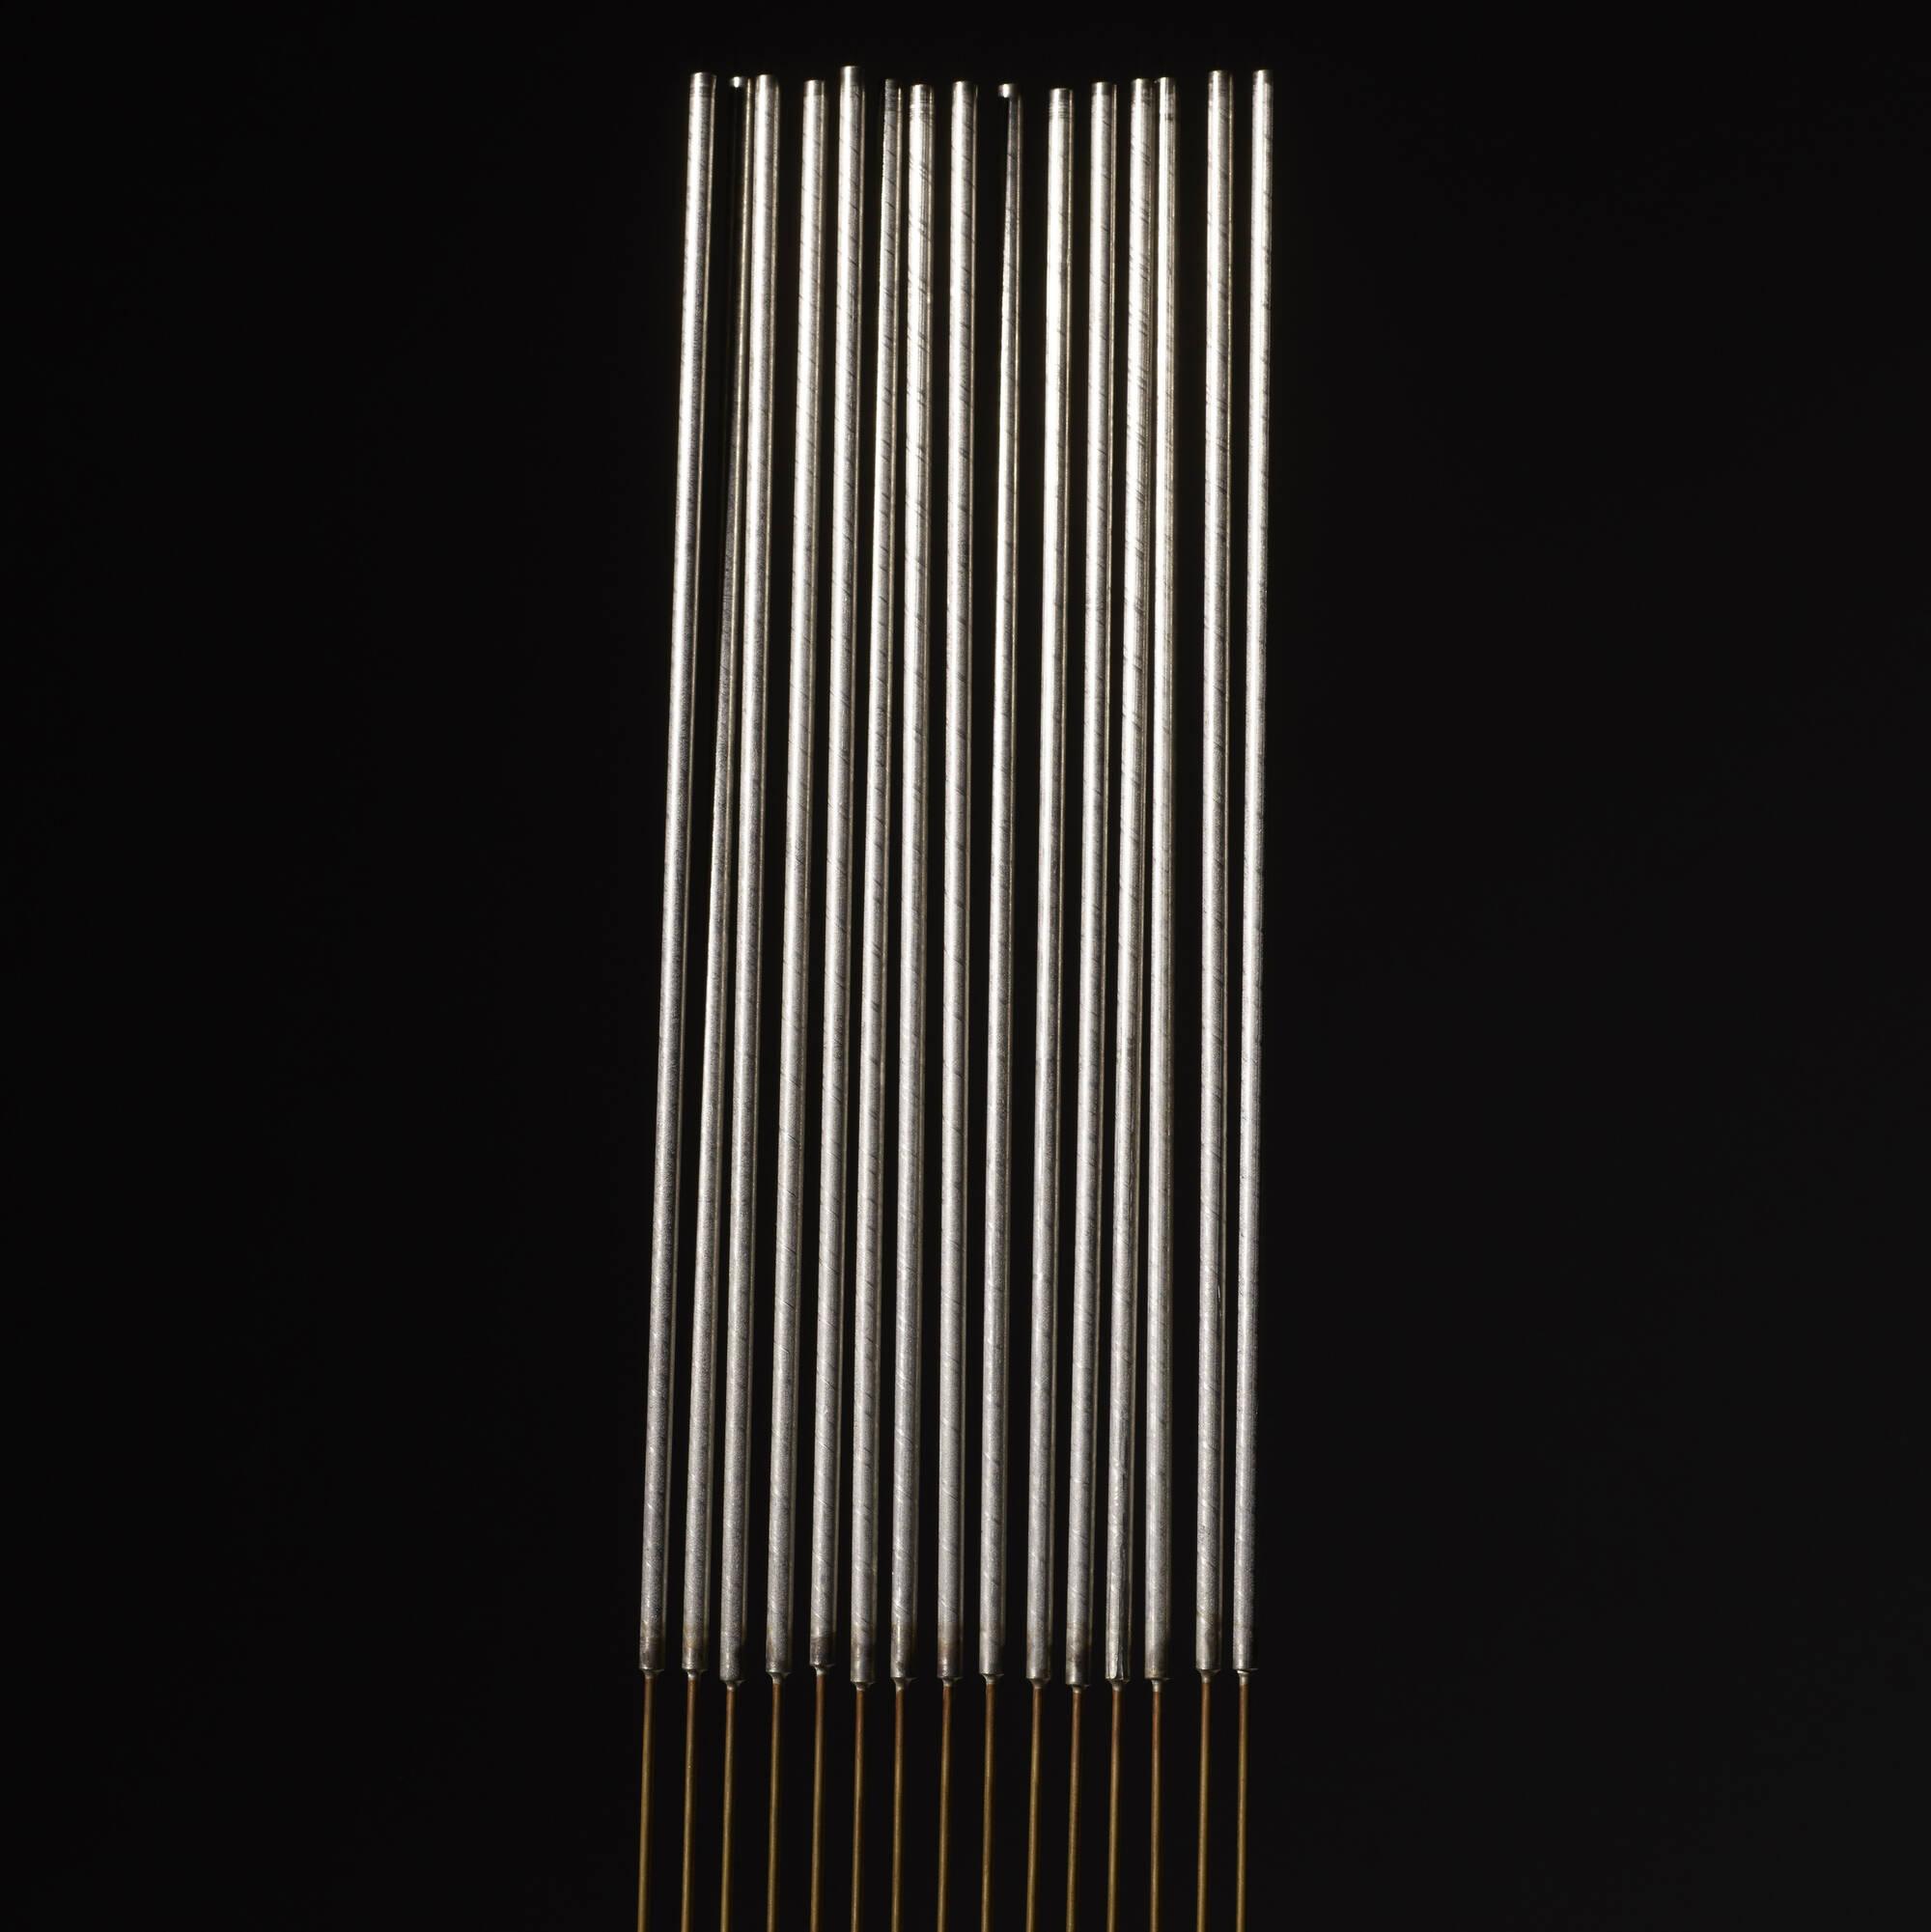 136: Harry Bertoia / Untitled (Sonambient) (3 of 3)